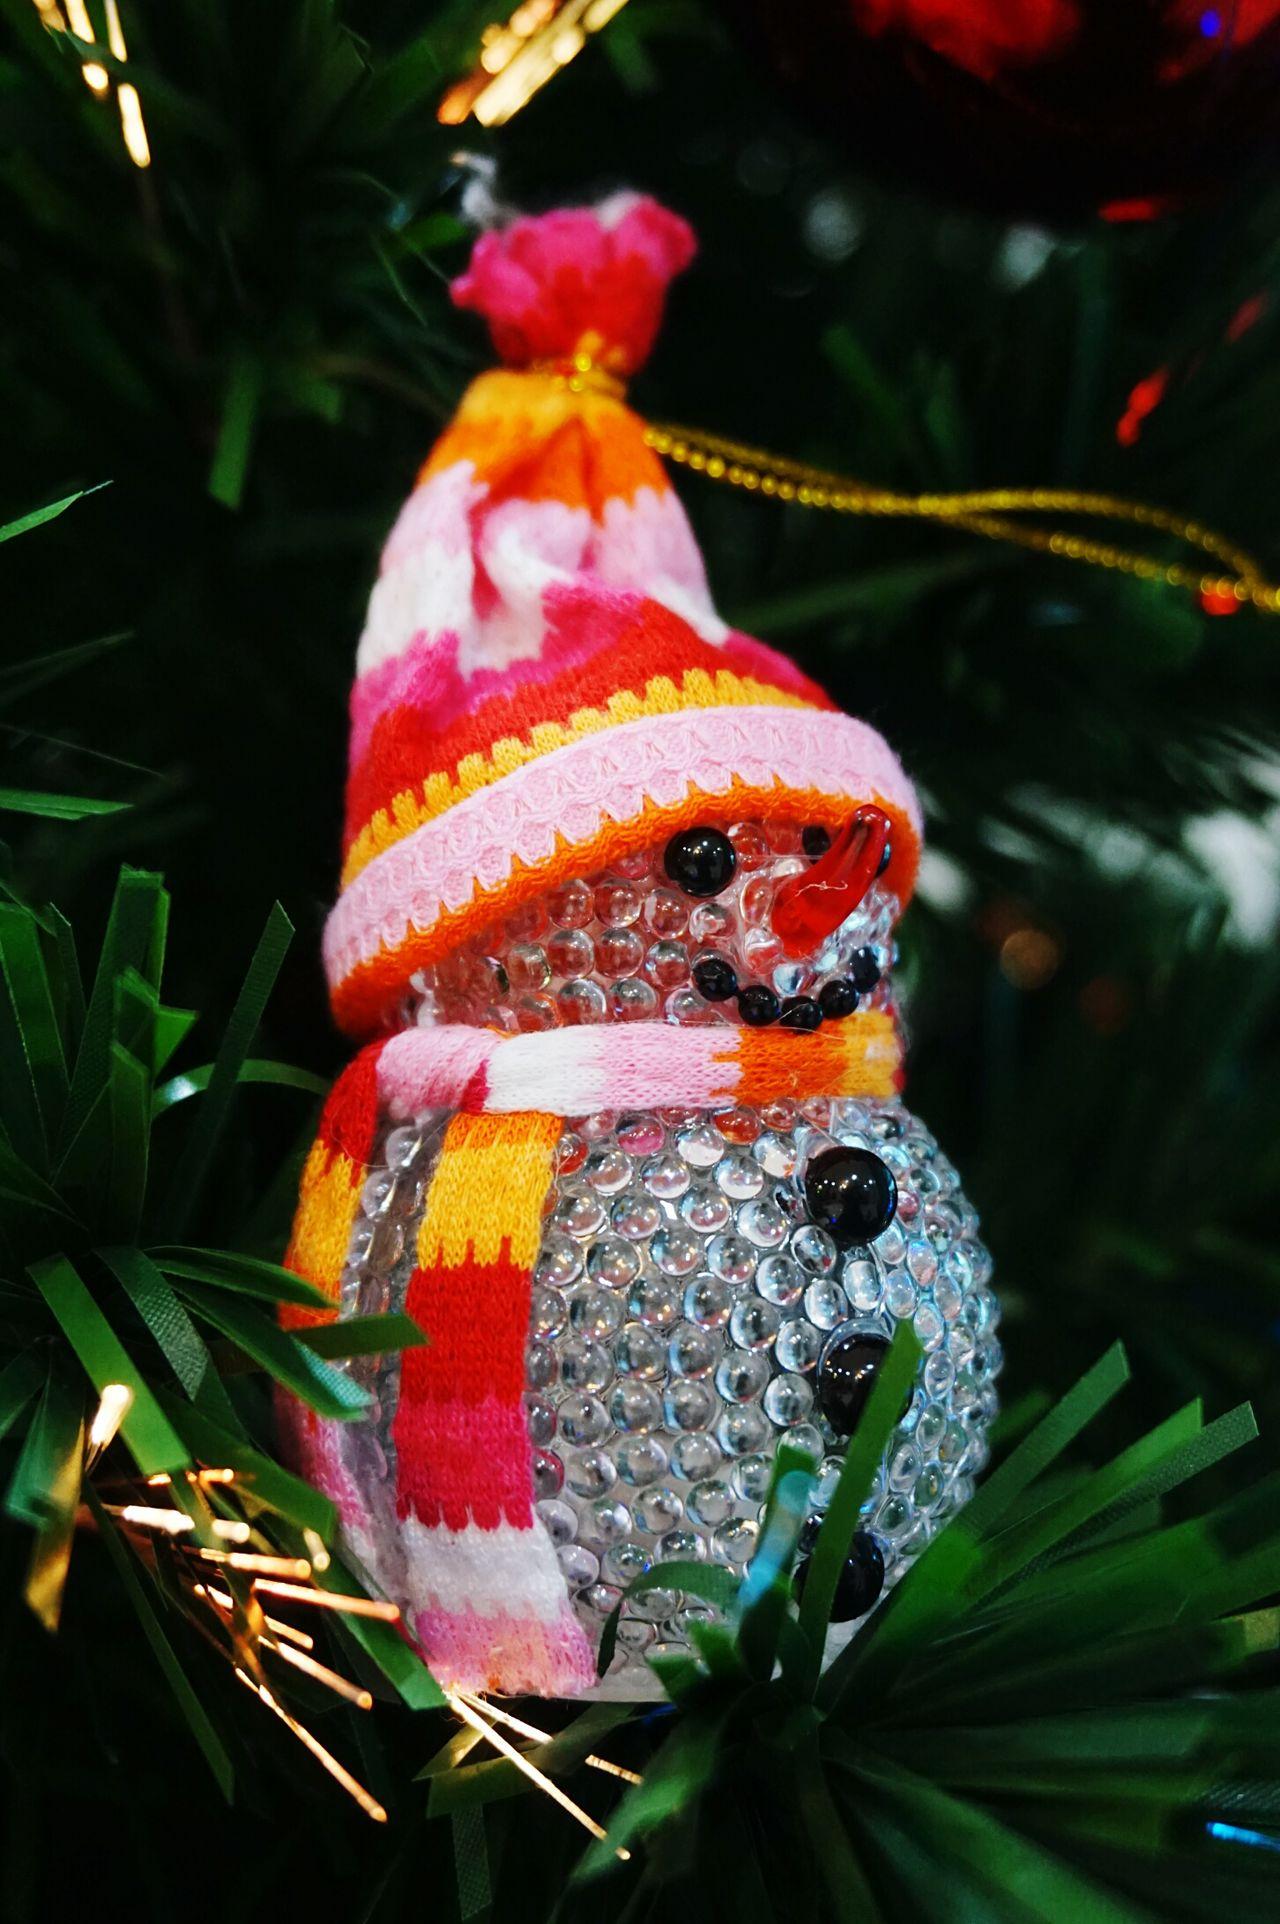 Snowman Decorations Taking Photos Cute